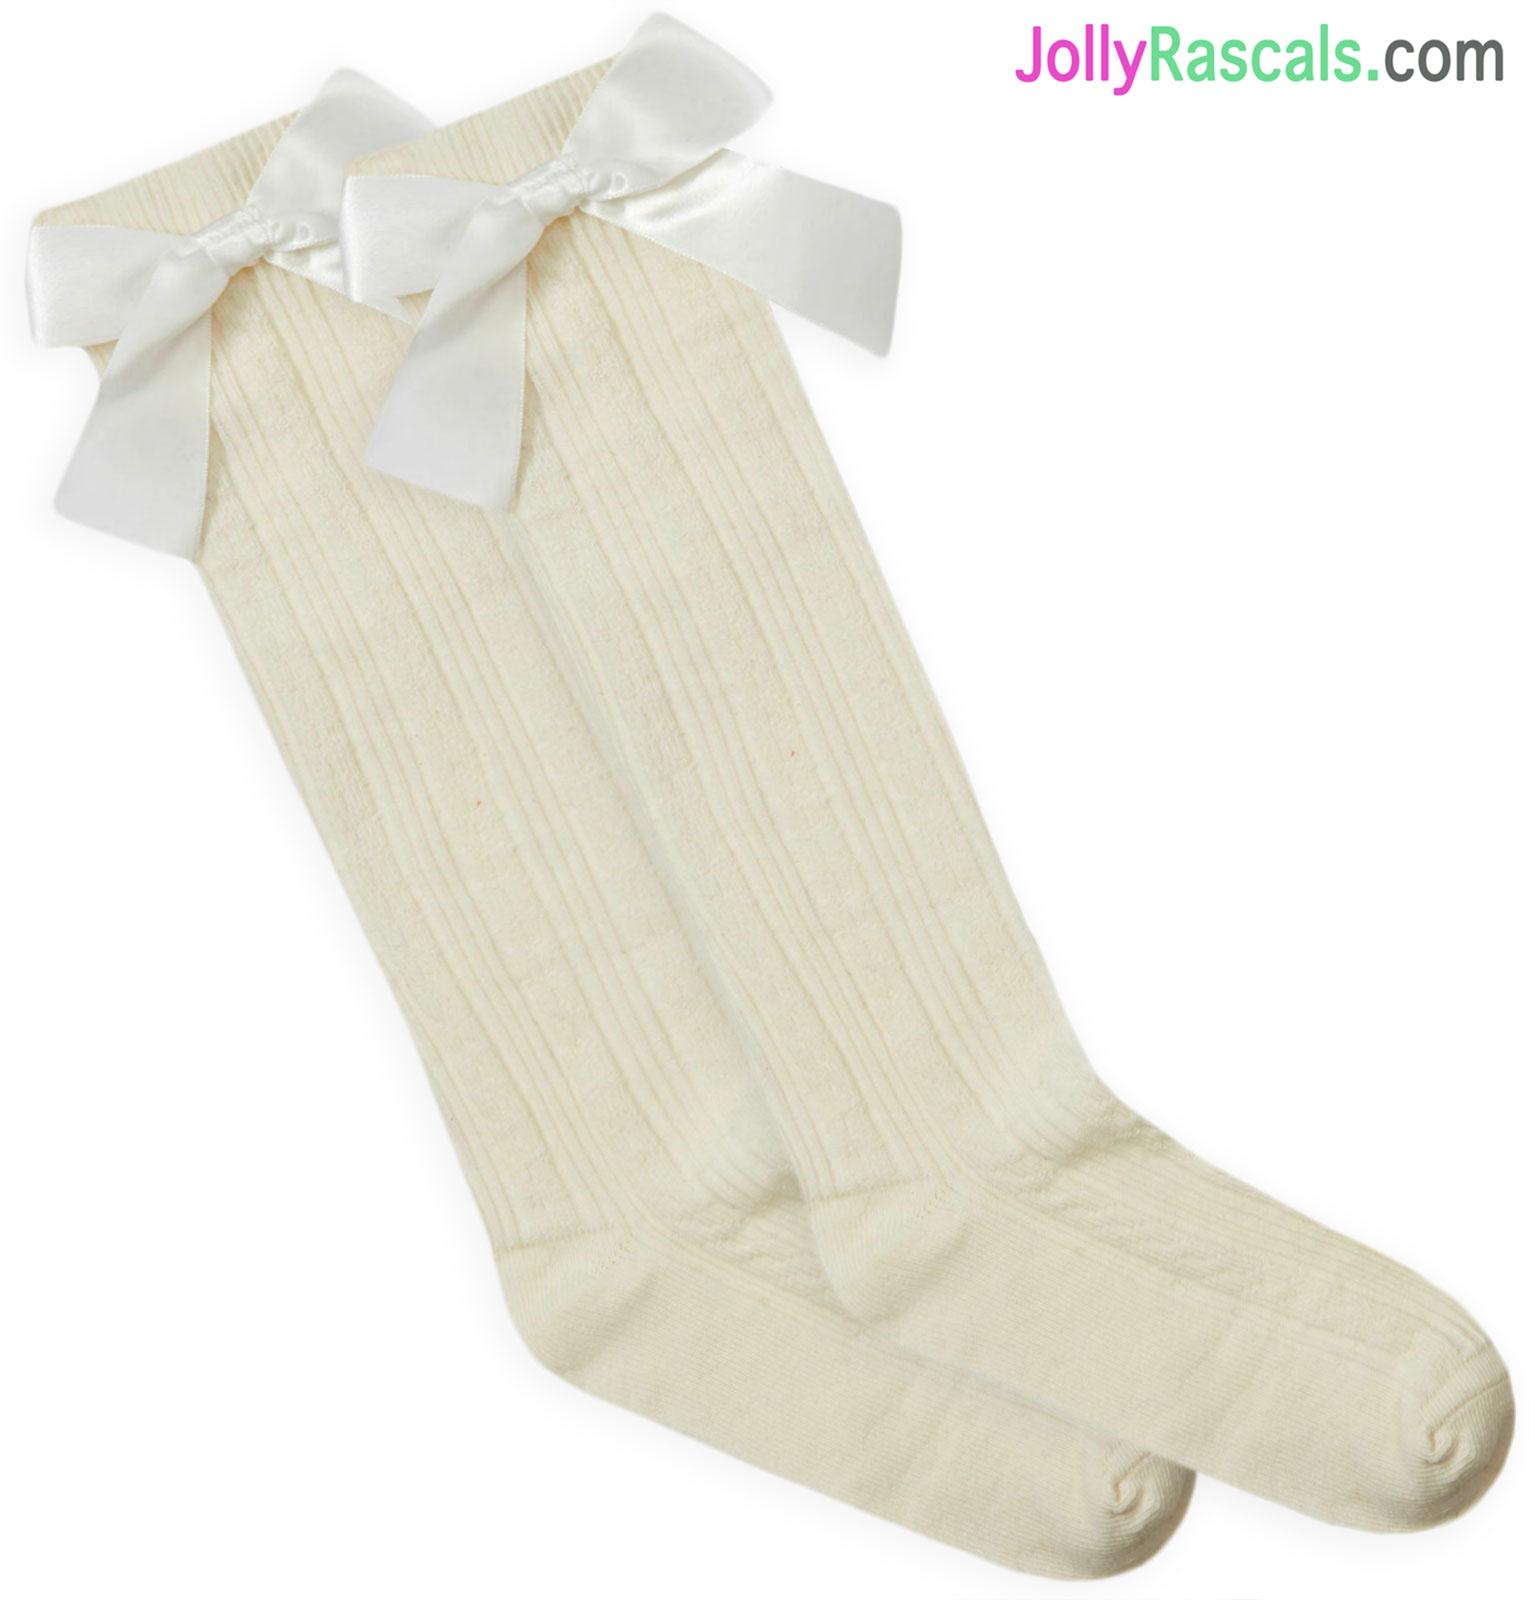 9-12 12-3. Two Pairs Girls Ballet Socks Size 6-8